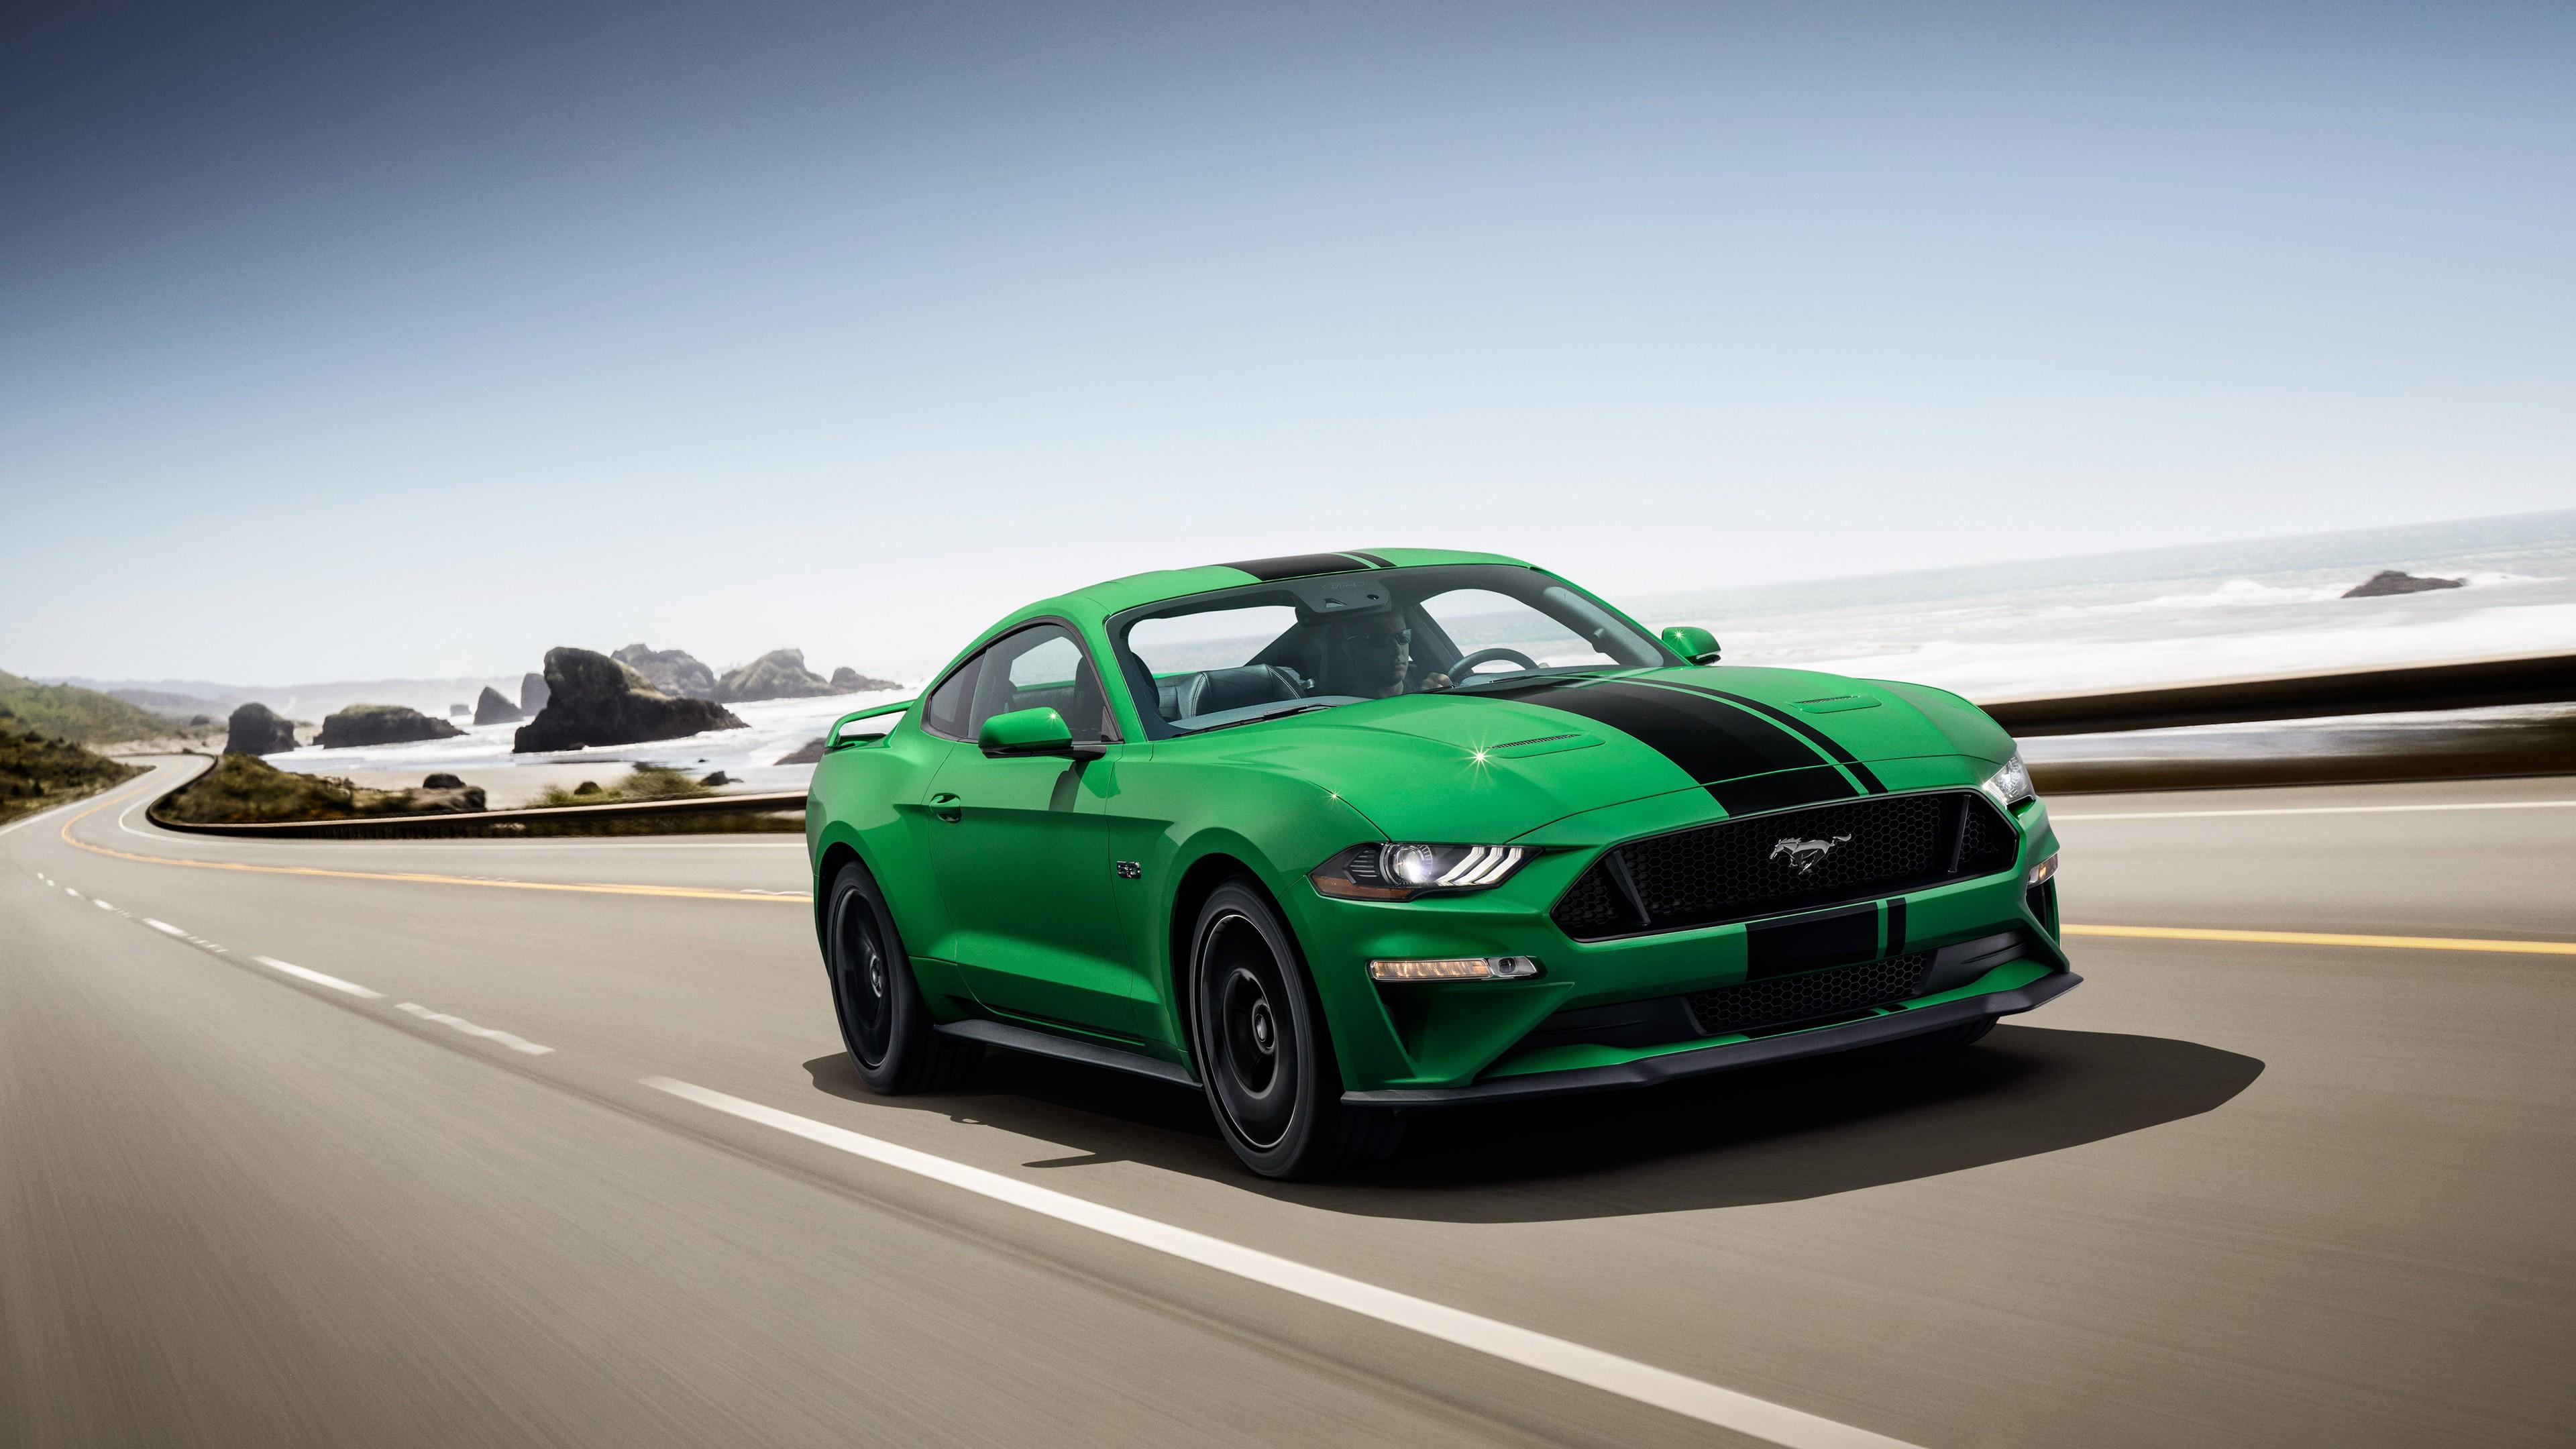 Mustang Hd Wallpapers For Desktop 2018 Ford Mustang Gt Fastback 4k